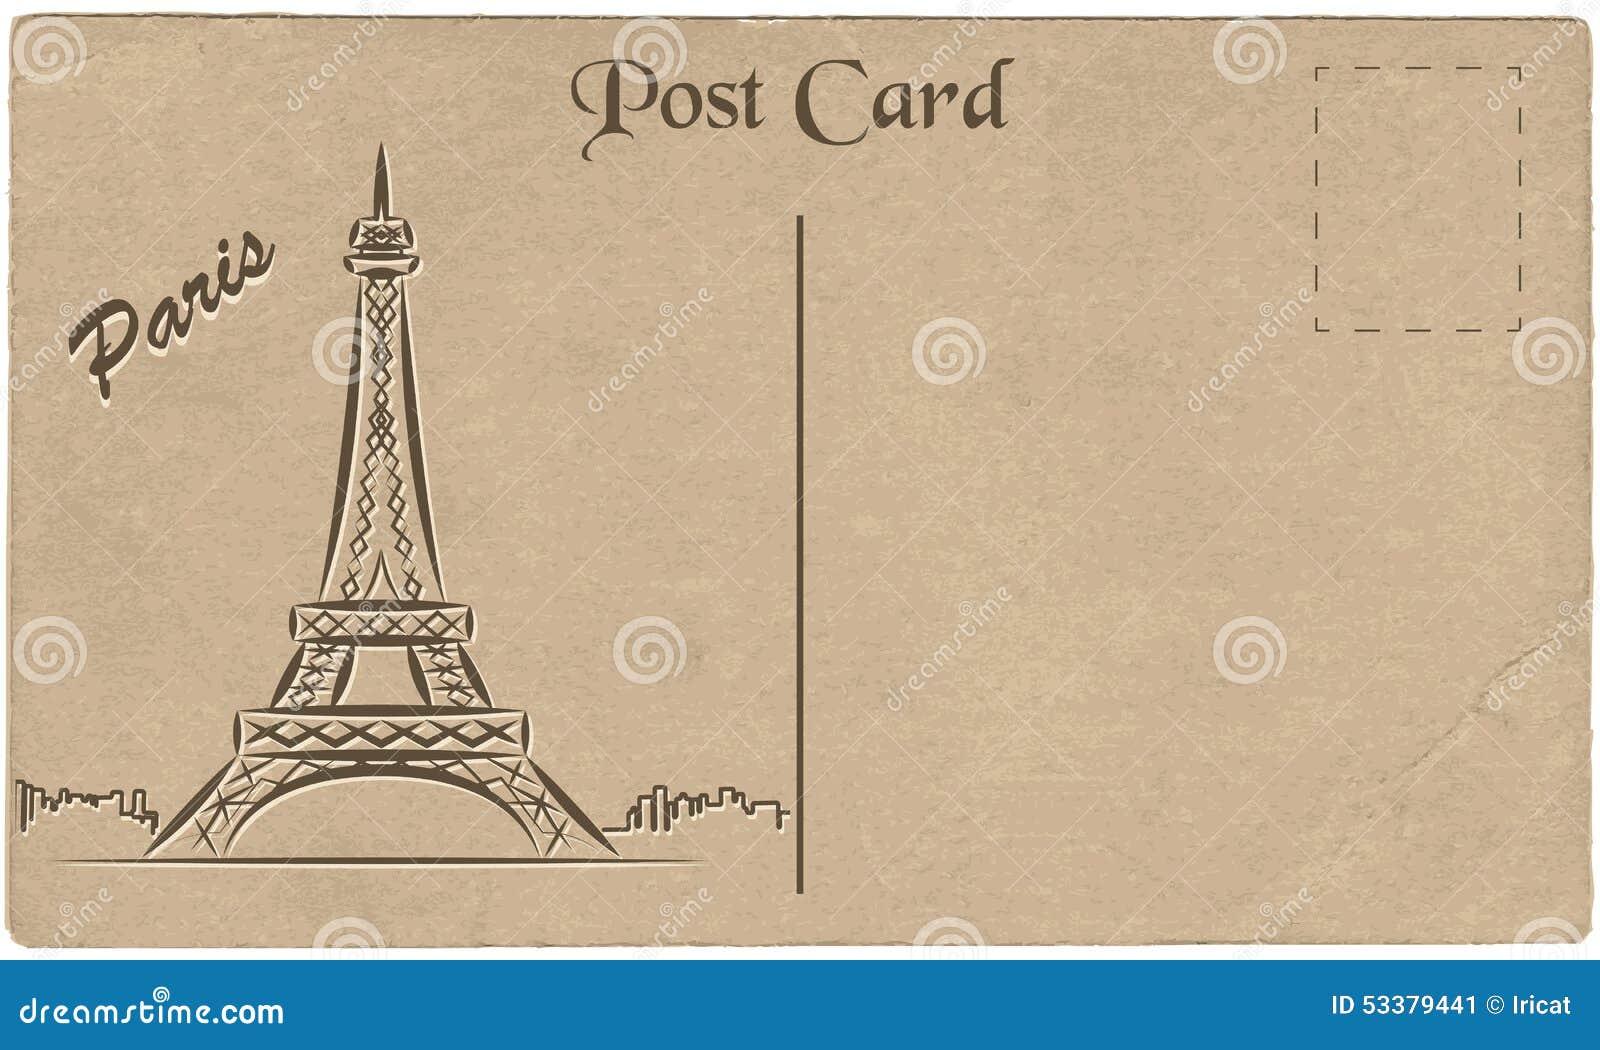 Eiffel Tower Invitation is amazing invitation design